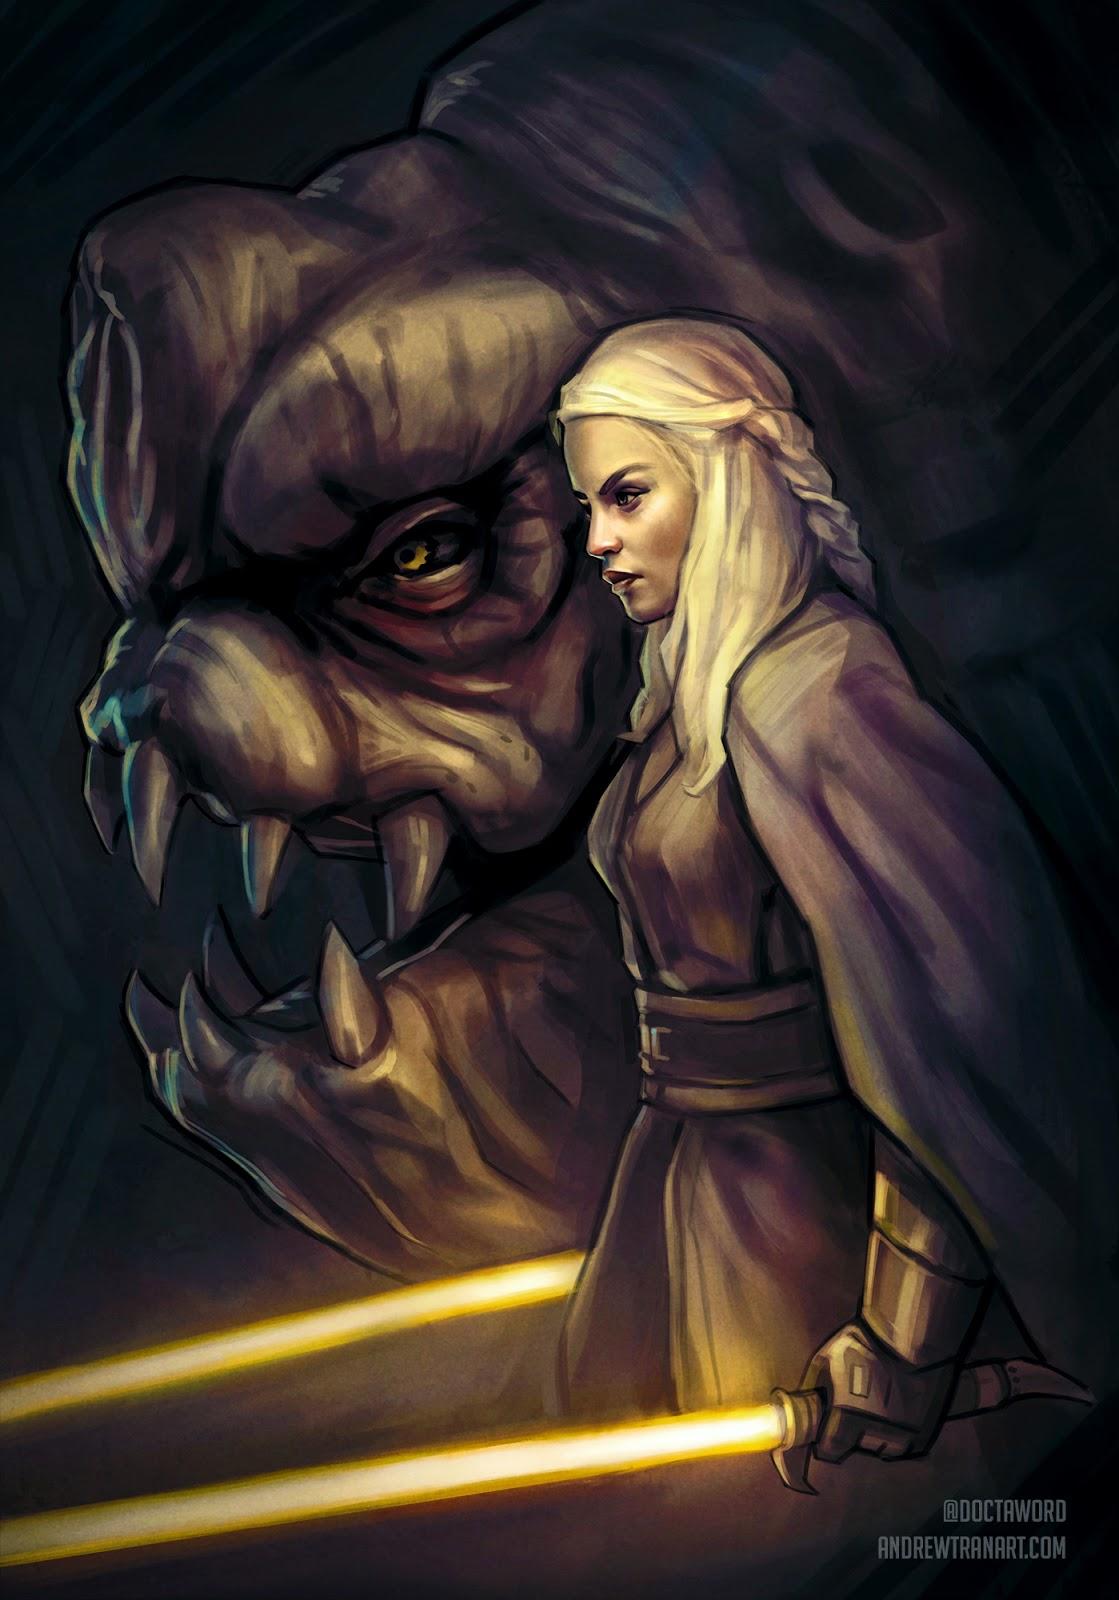 Daenerys Madre de Rancors